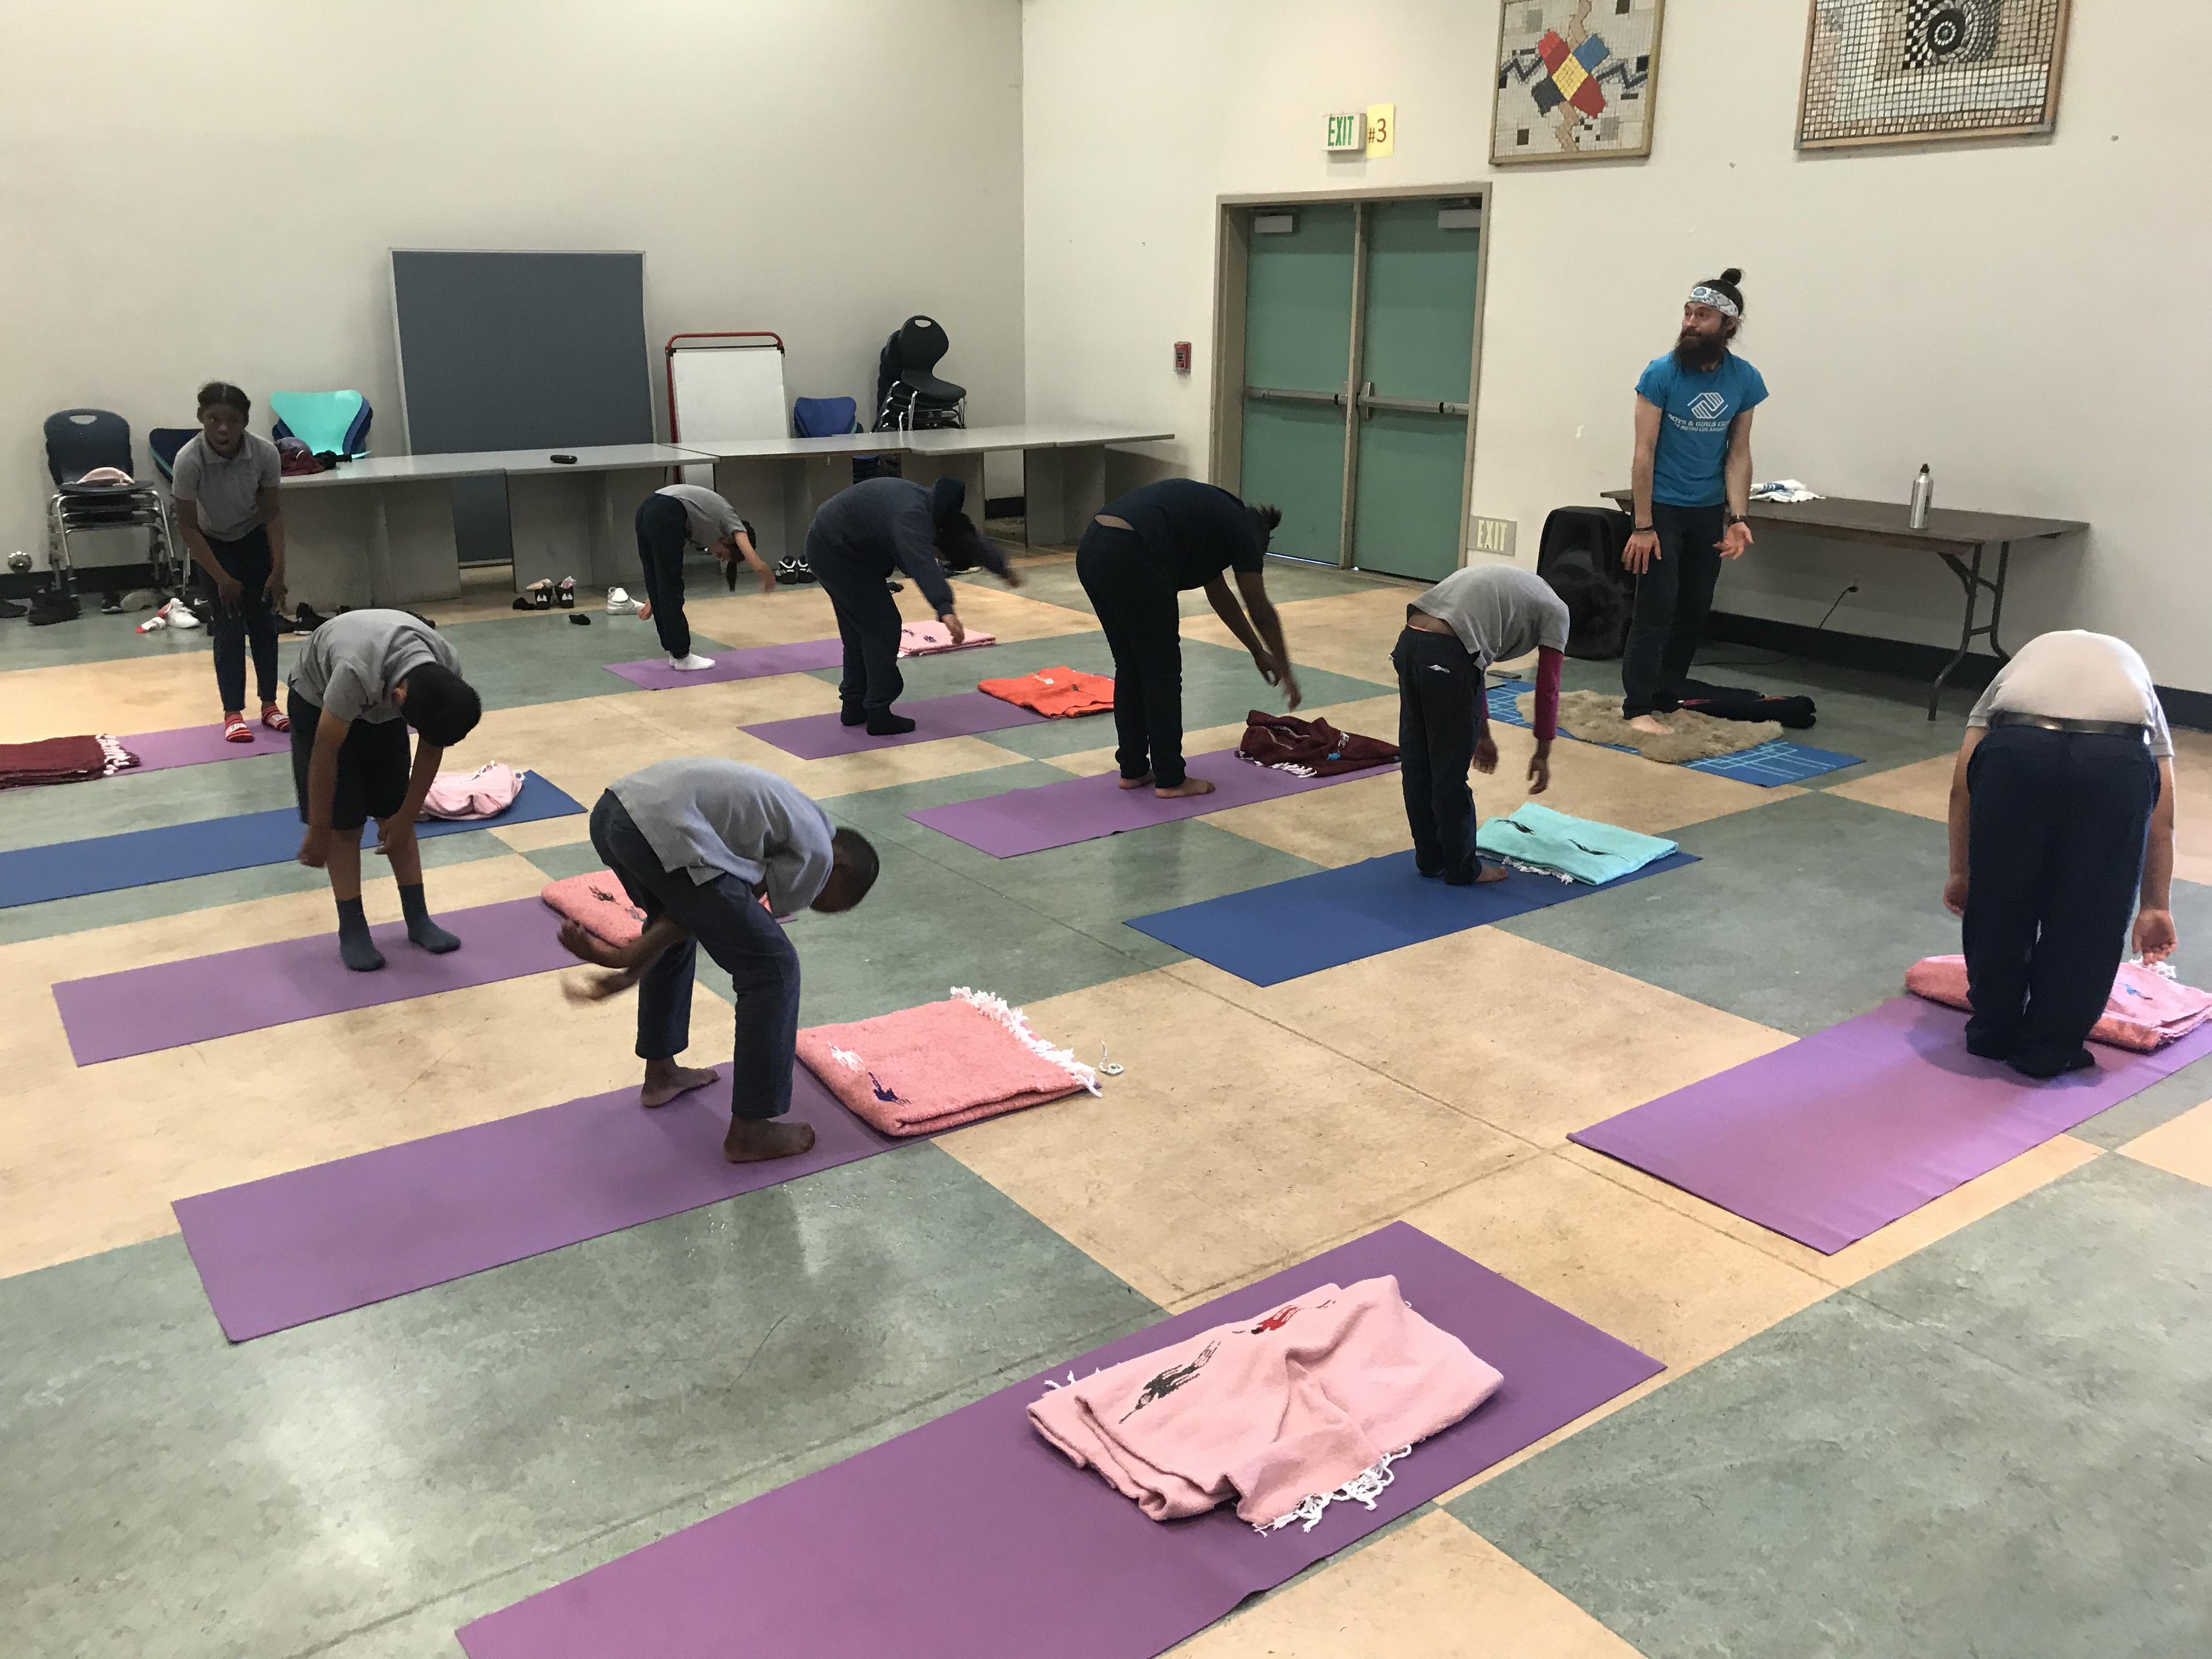 m-lorusso-yoga-challengers-IMG_5649.jpg